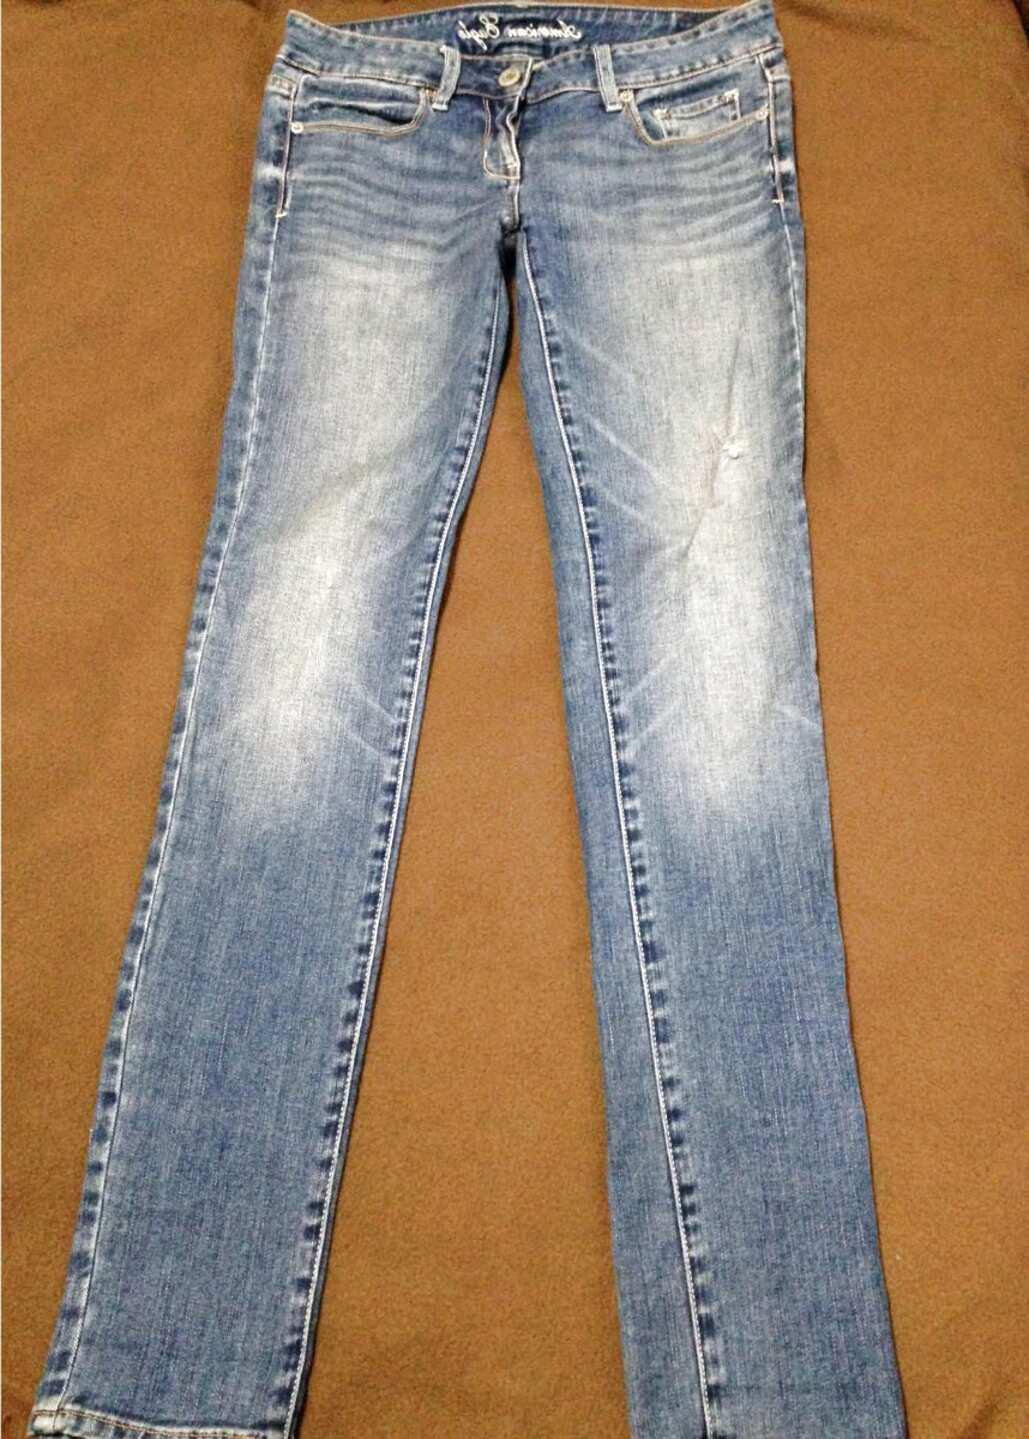 Venta De Pantalon Hollister 31 Articulos Usados